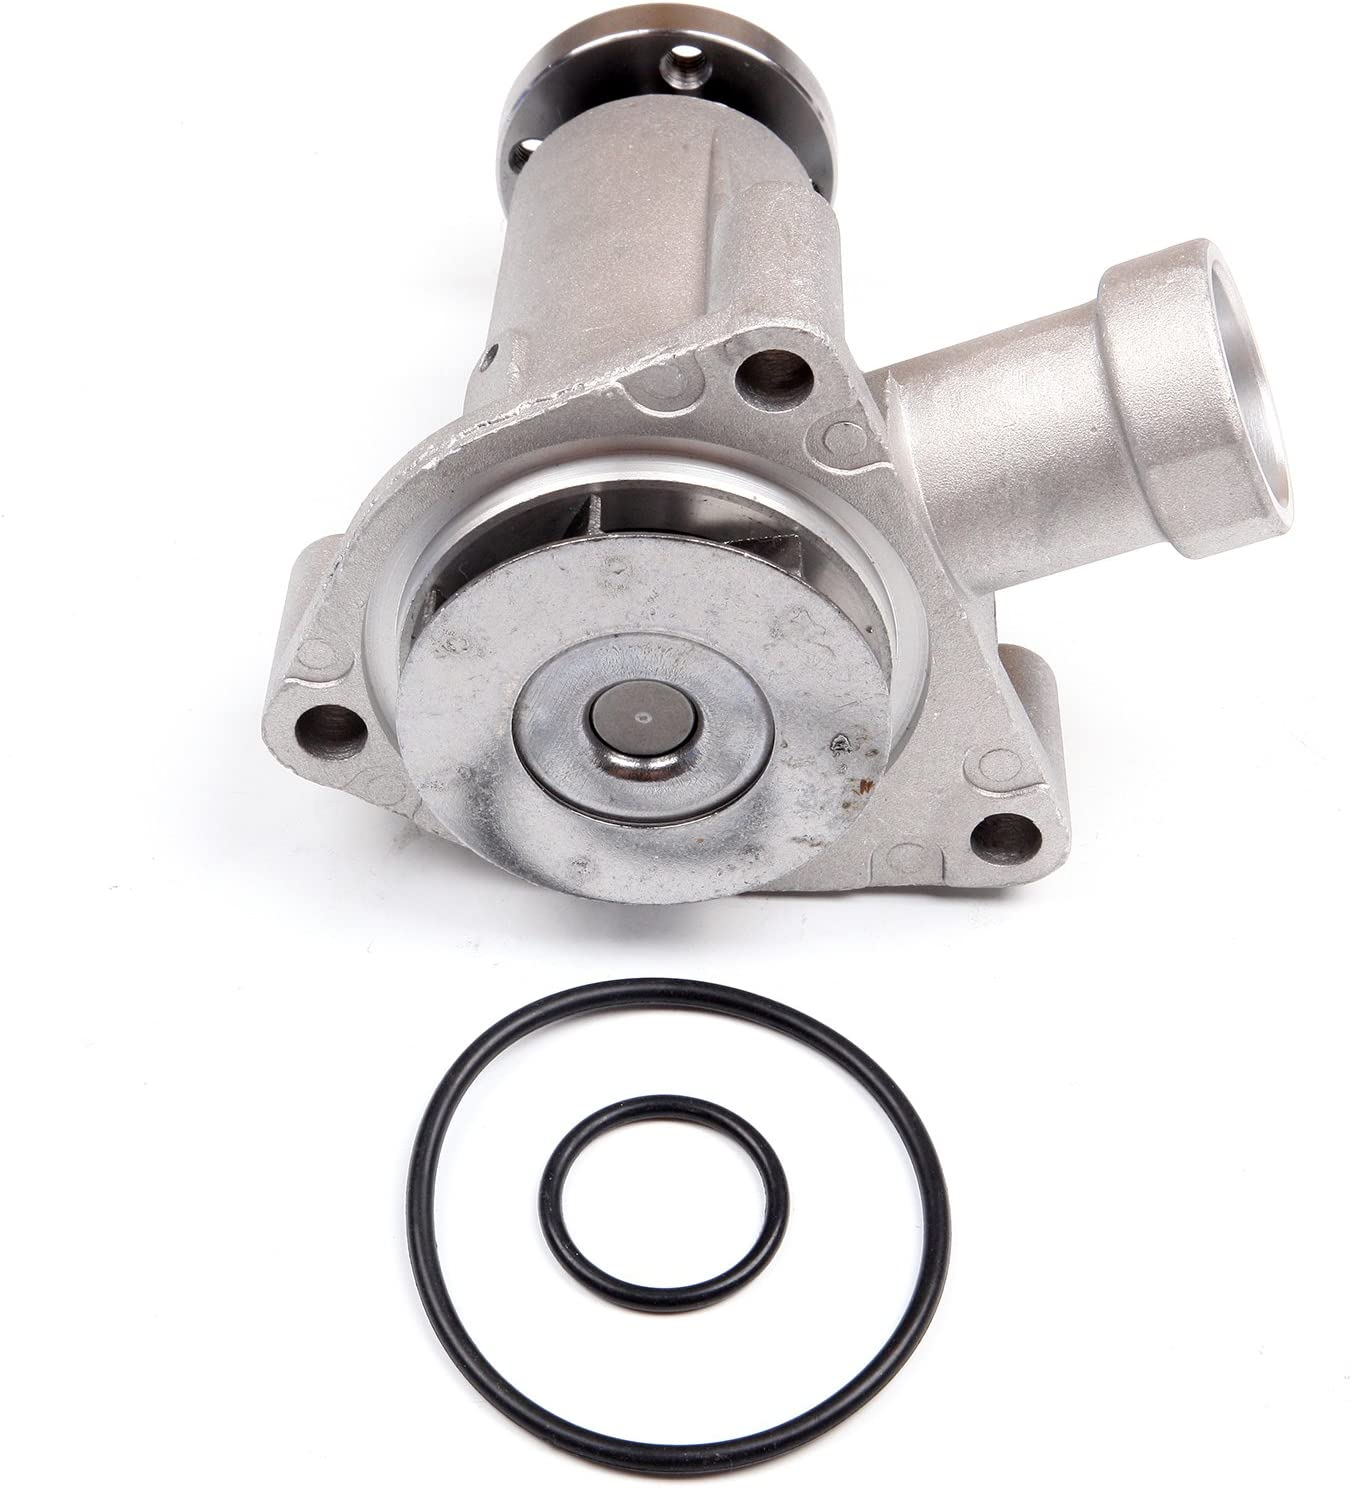 QUALINSIST Low Noise Timing Belt Kits Use for 1995-2001 F-ord Ranger 1995-1997 Ms-azda B2300 1998-2001 Ms-azda B2500